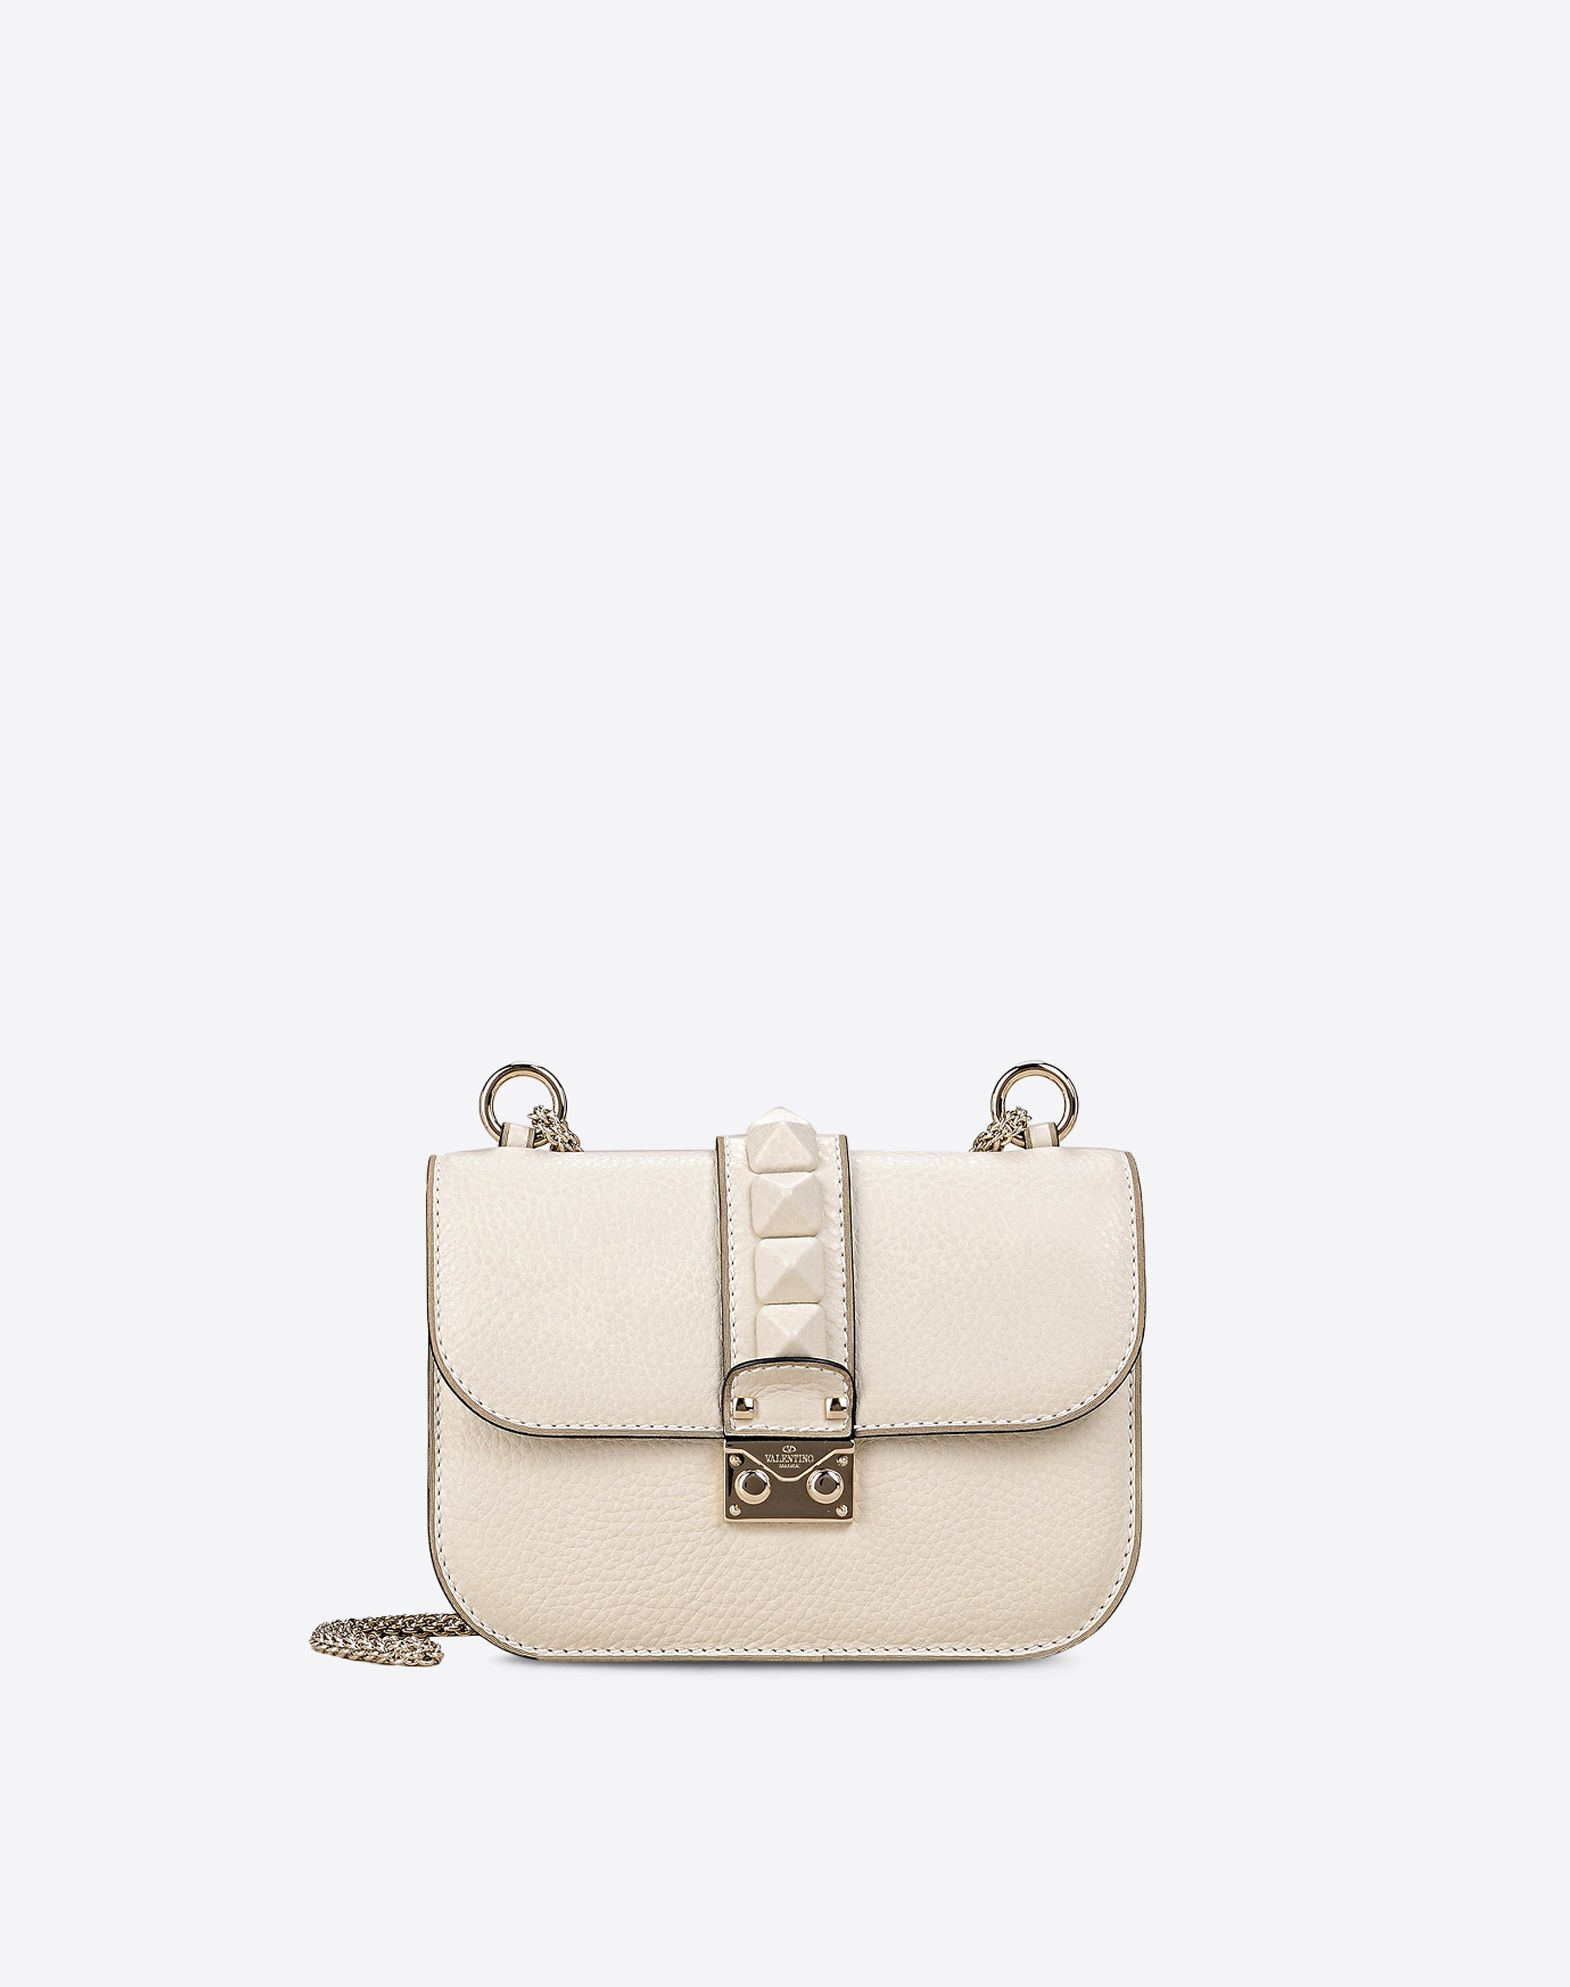 VALENTINO Small chain shoulder bag 45273219cg